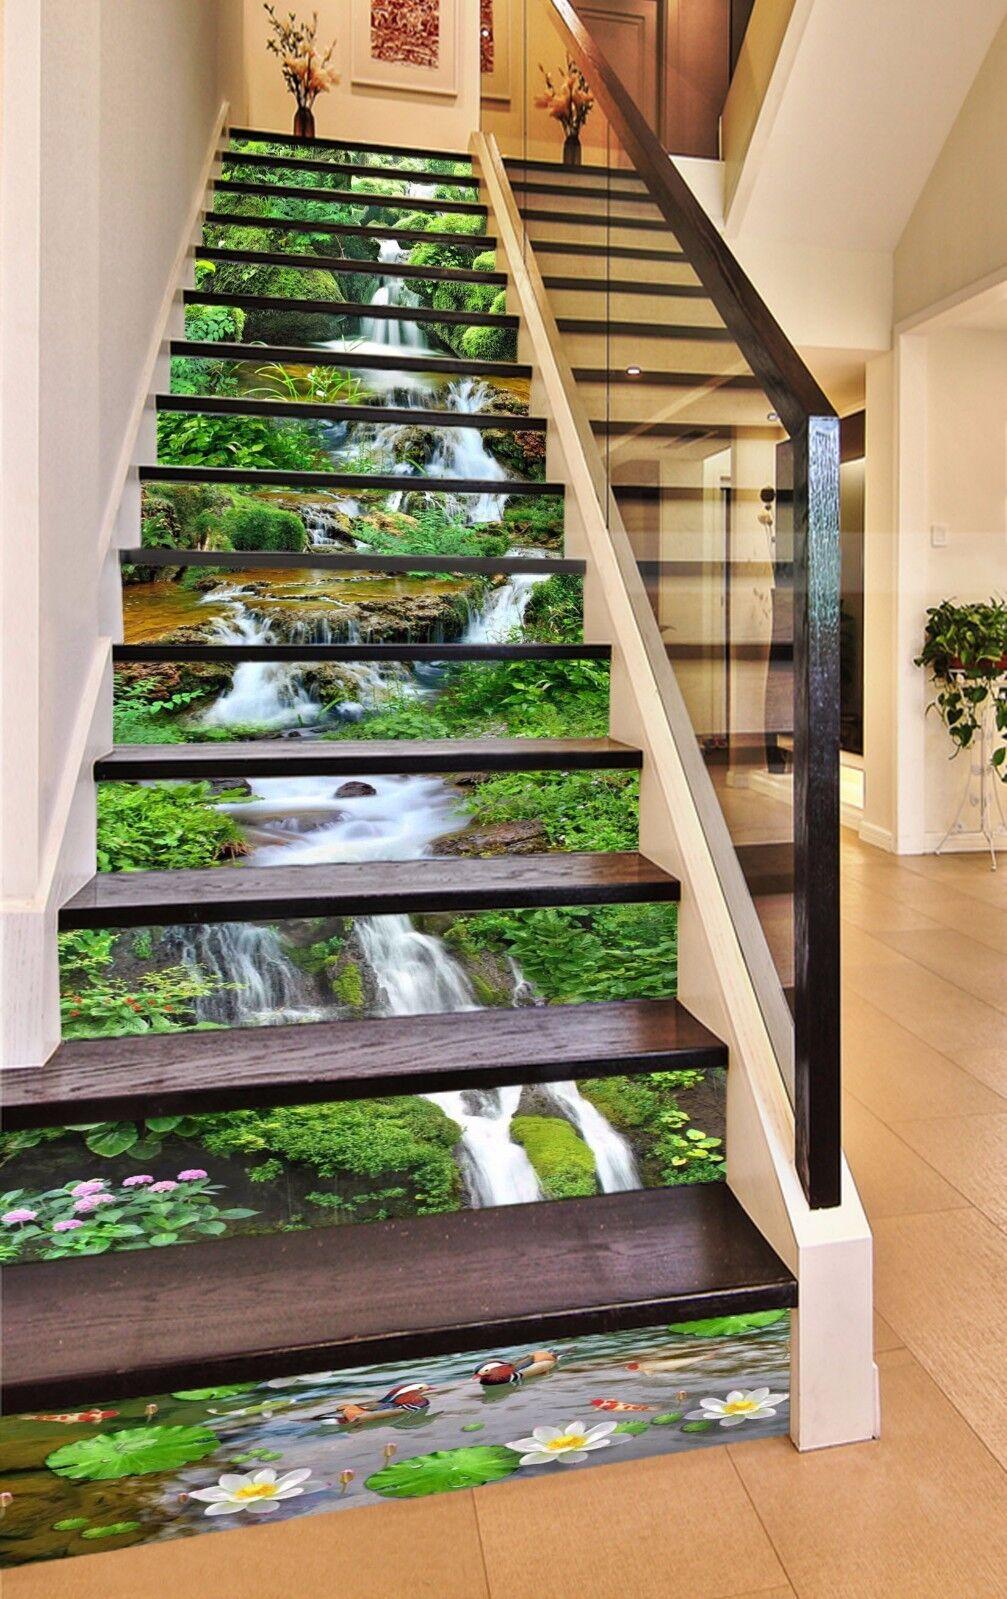 3D Green Creek 320 Stairs Risers Decoration Photo Mural Vinyl Decal Wallpaper US